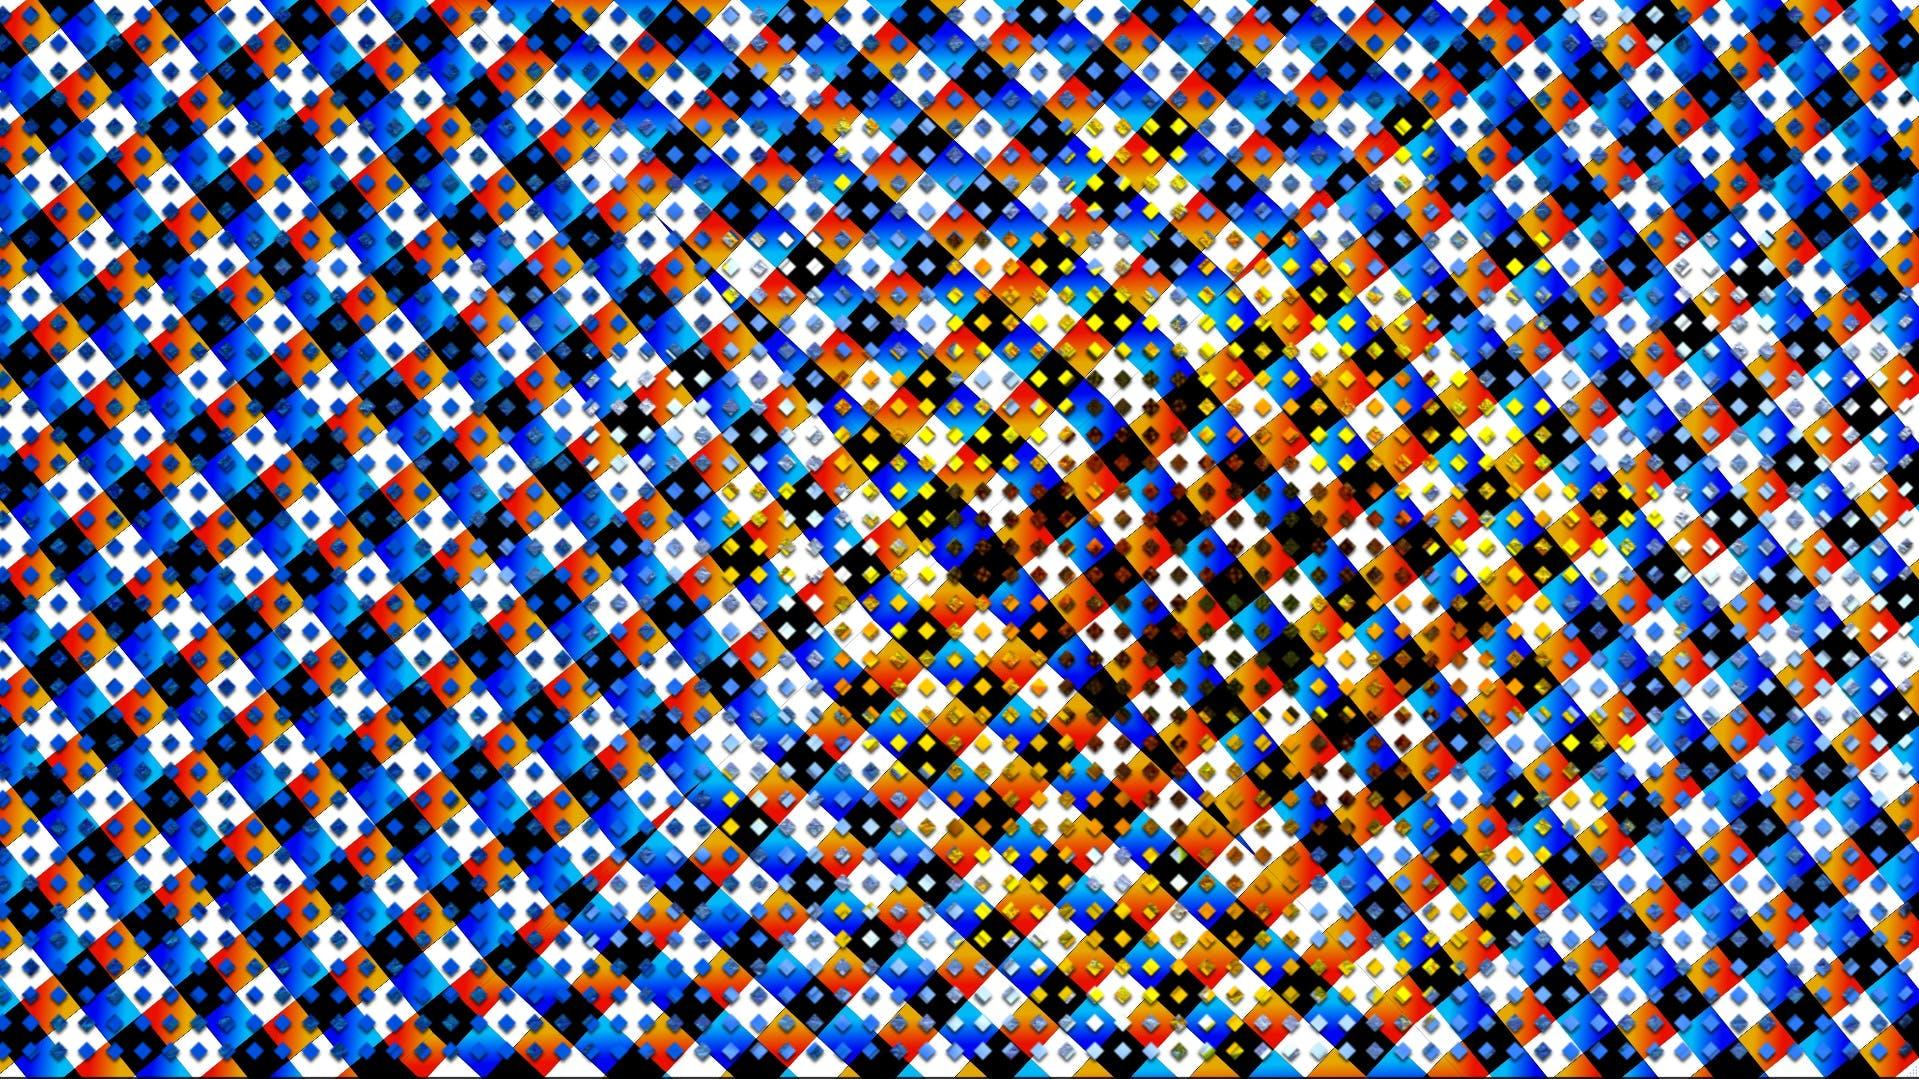 Free stock photo of #kaleidoscope art #unique design #kaleidoscope dra